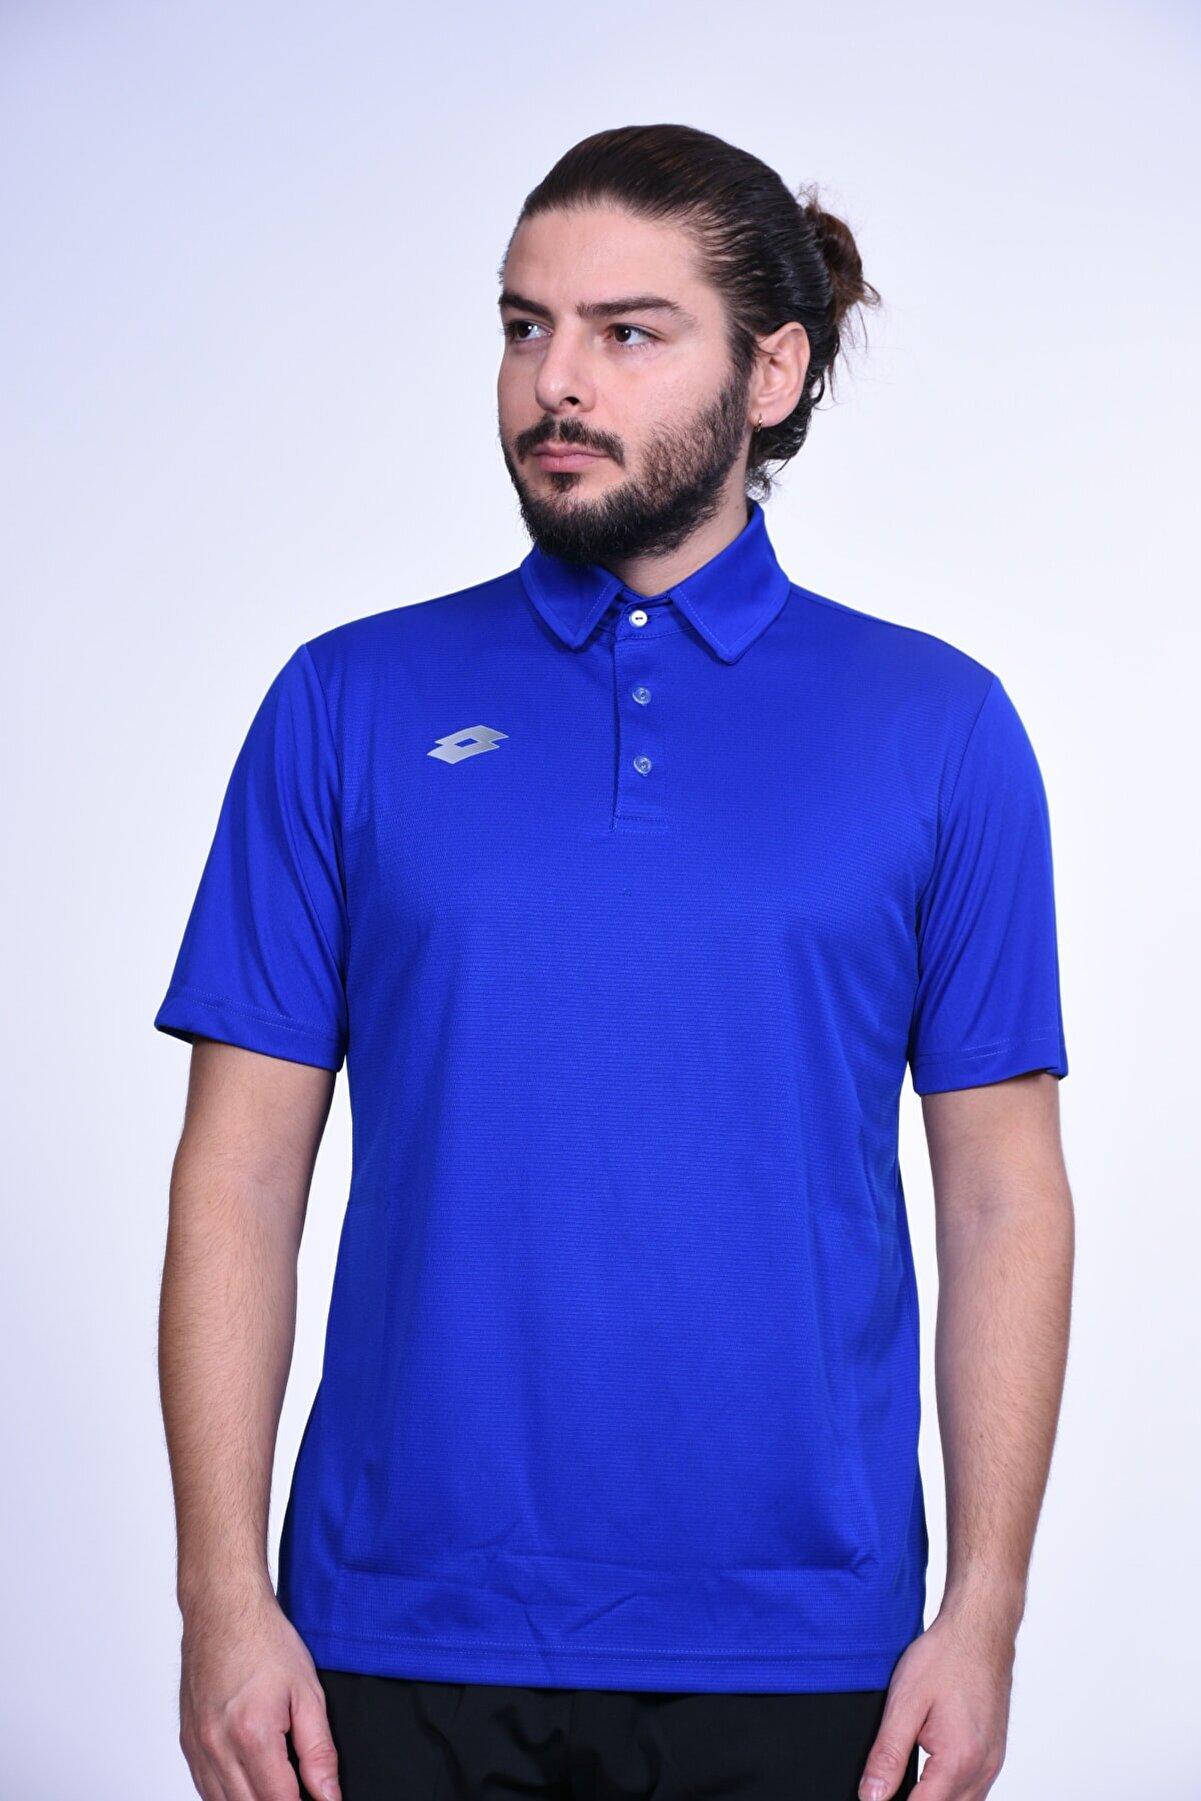 Lotto Erkek Polo Yaka T-shirt - Polo Mlt Pl Xıı - R8256